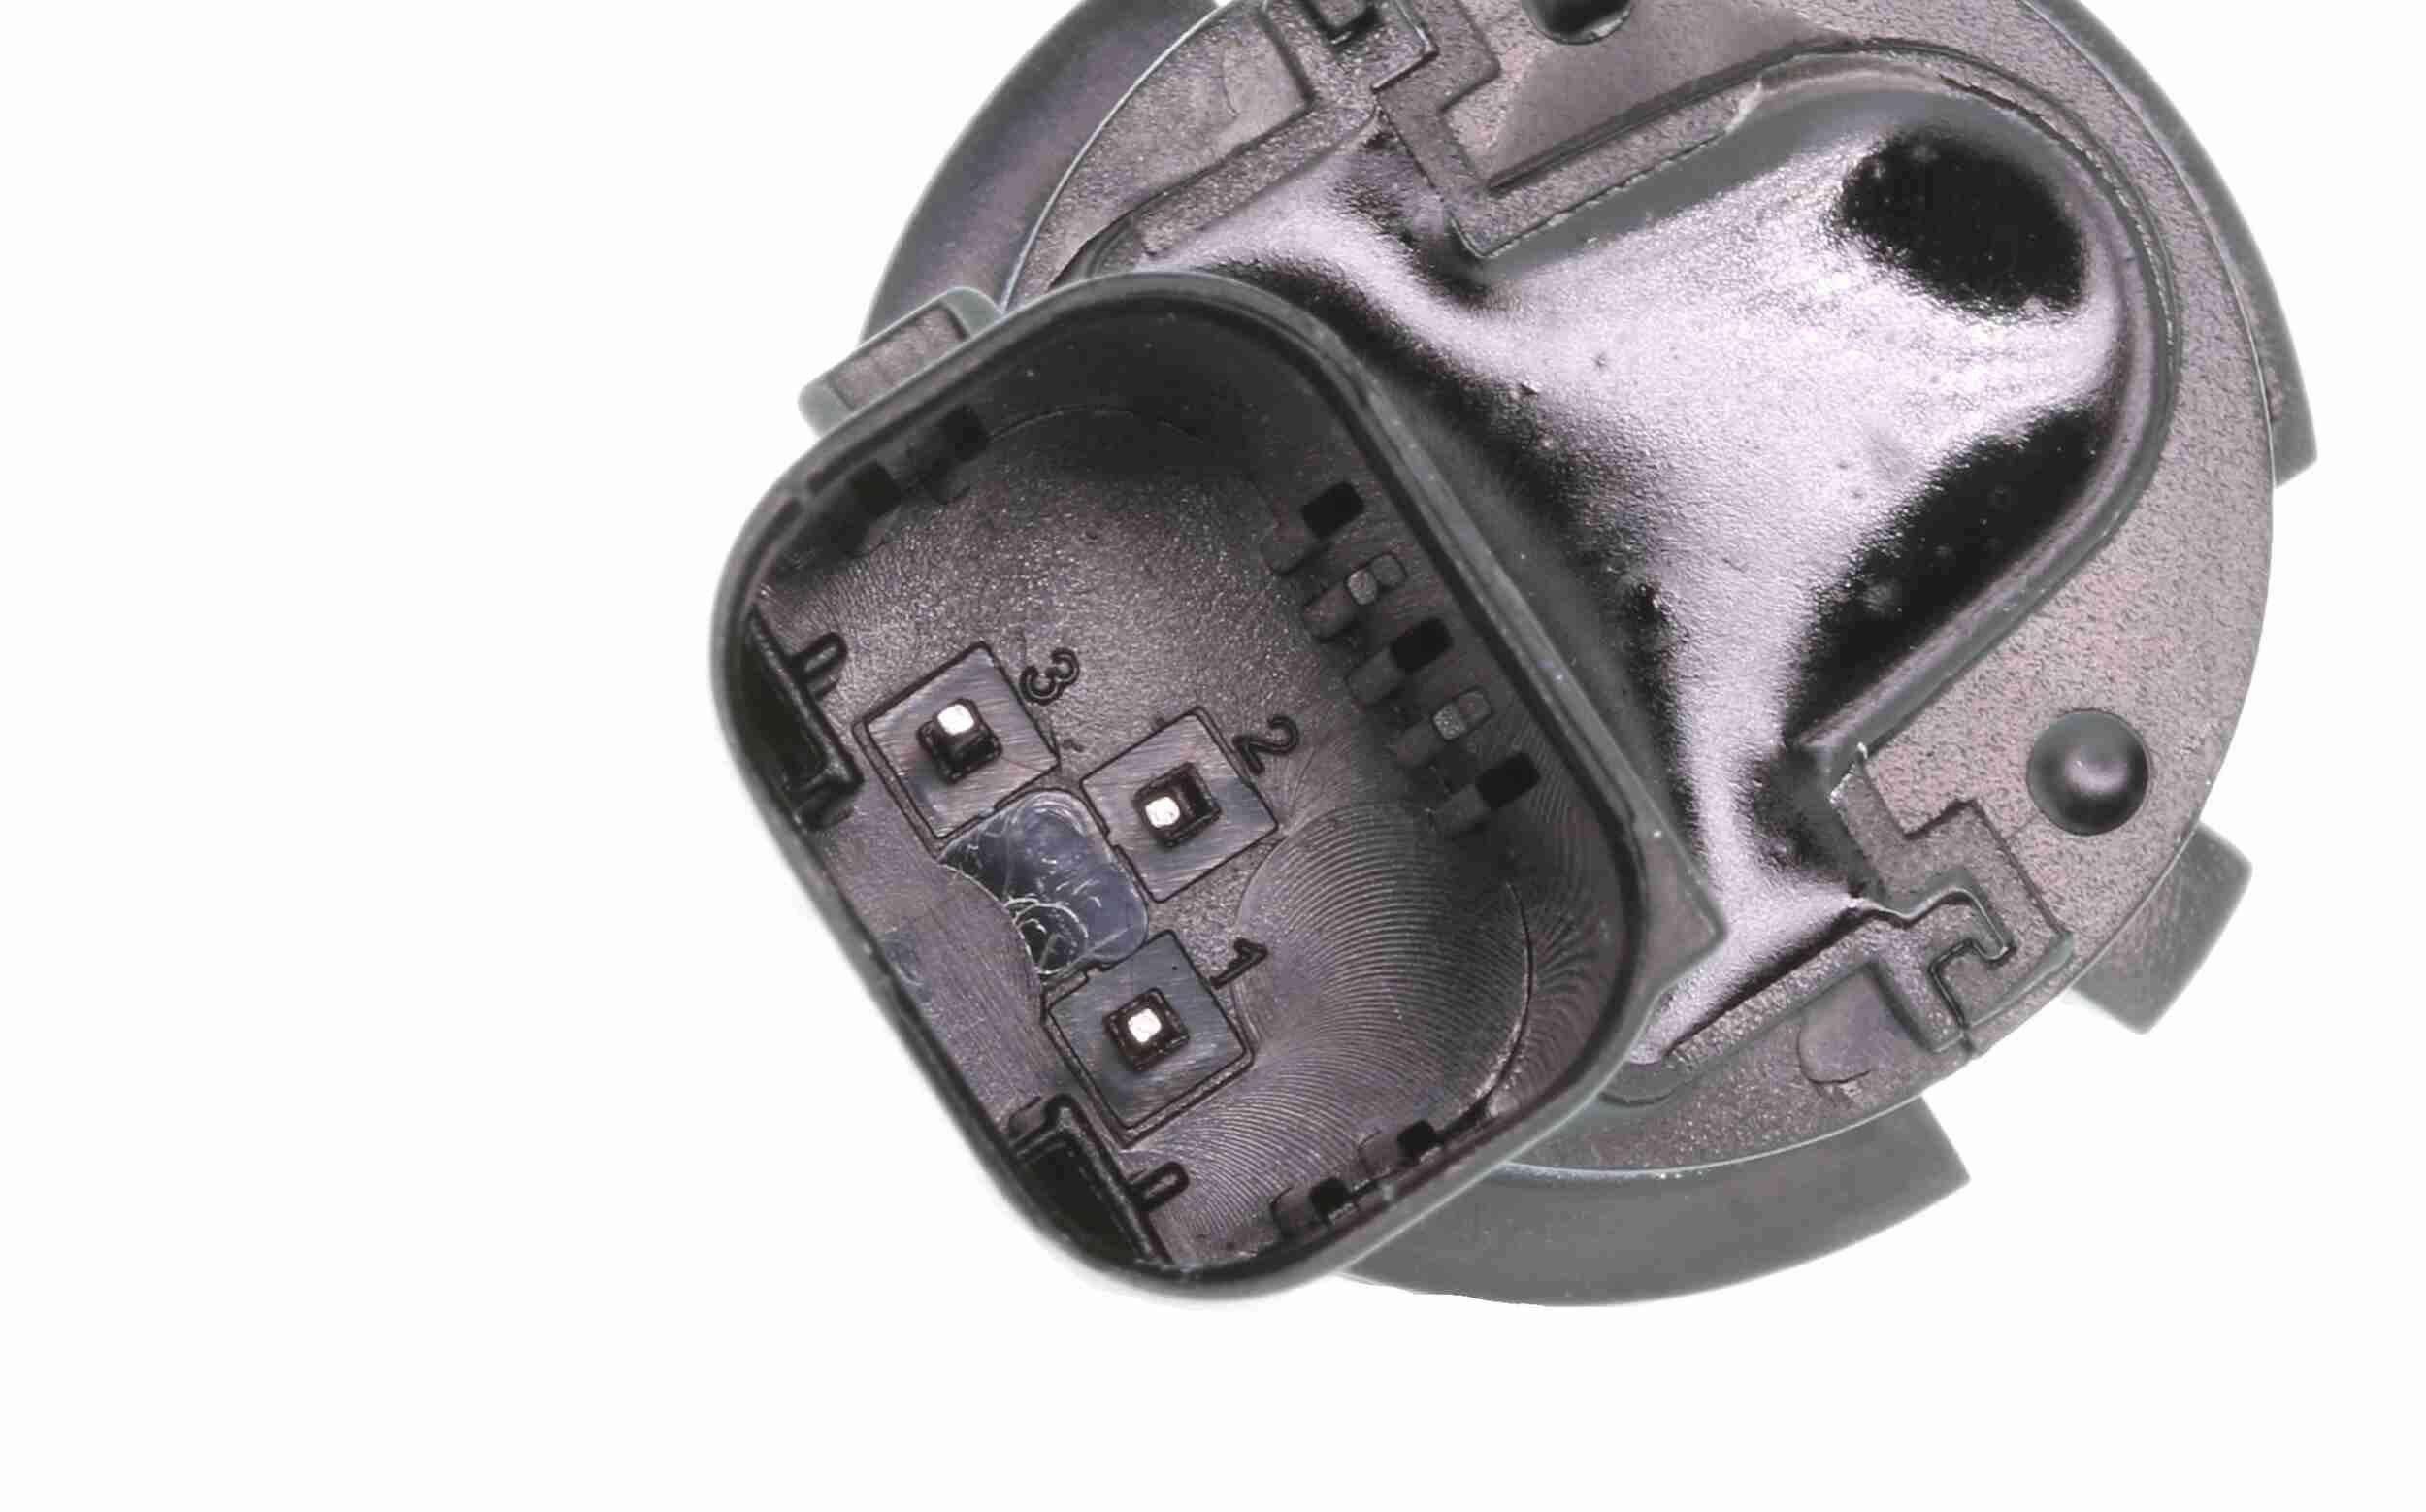 Czujnik parkowania VEMO V20-72-0019 oceny